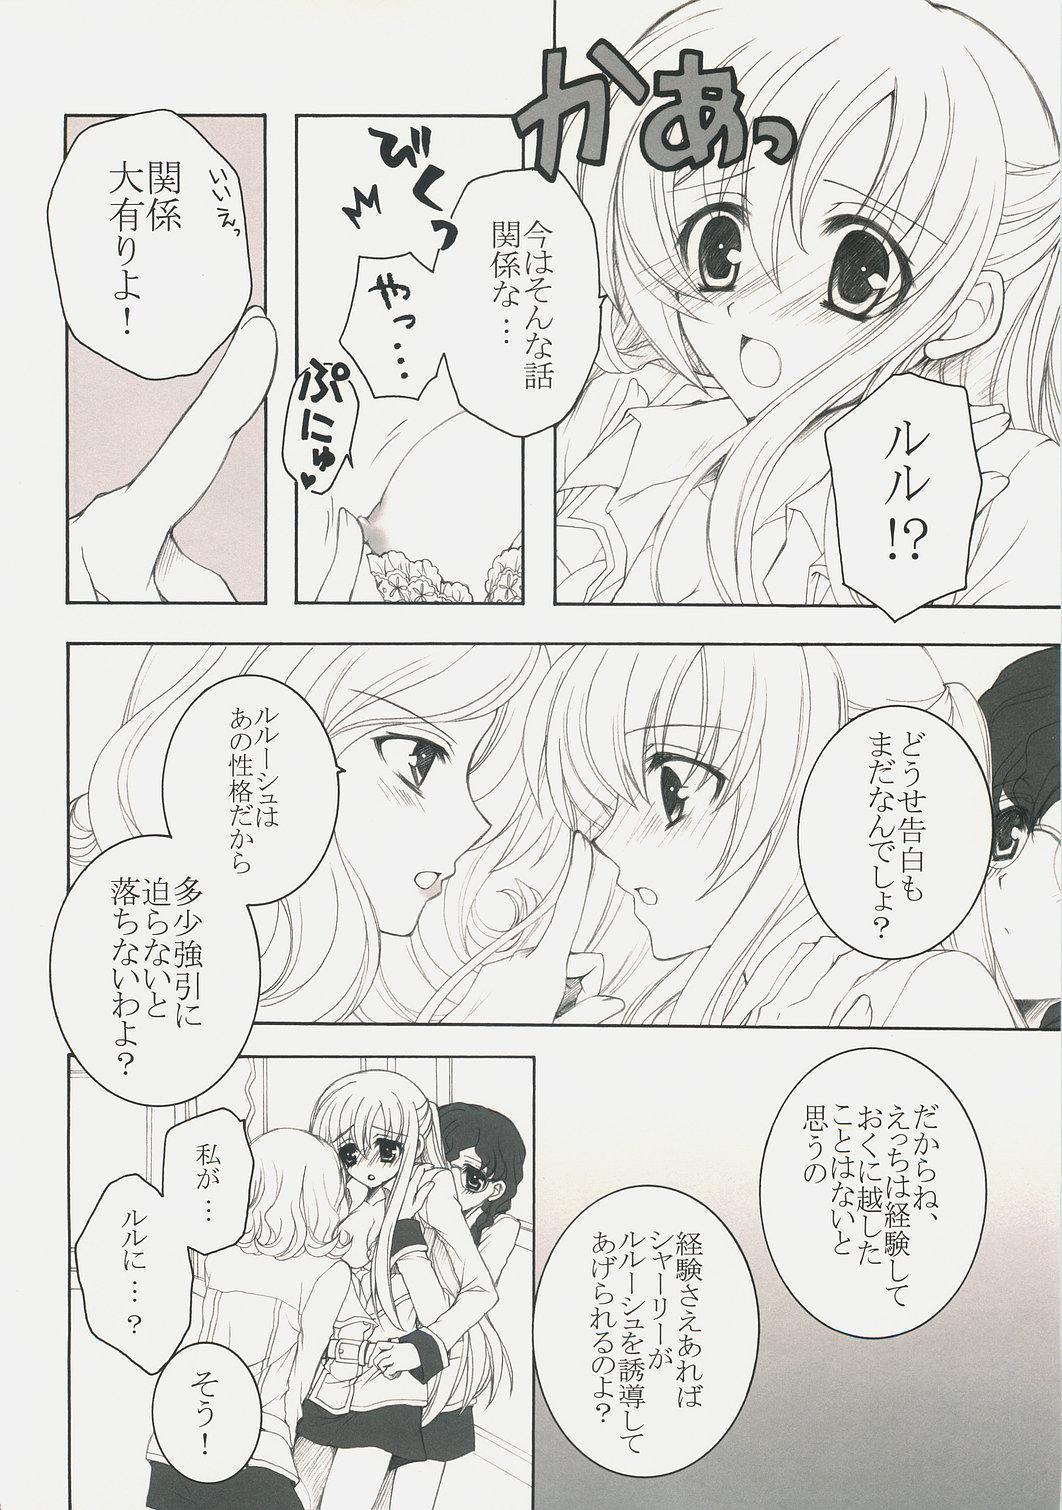 Youkoso, Ura Seitokai e! 6